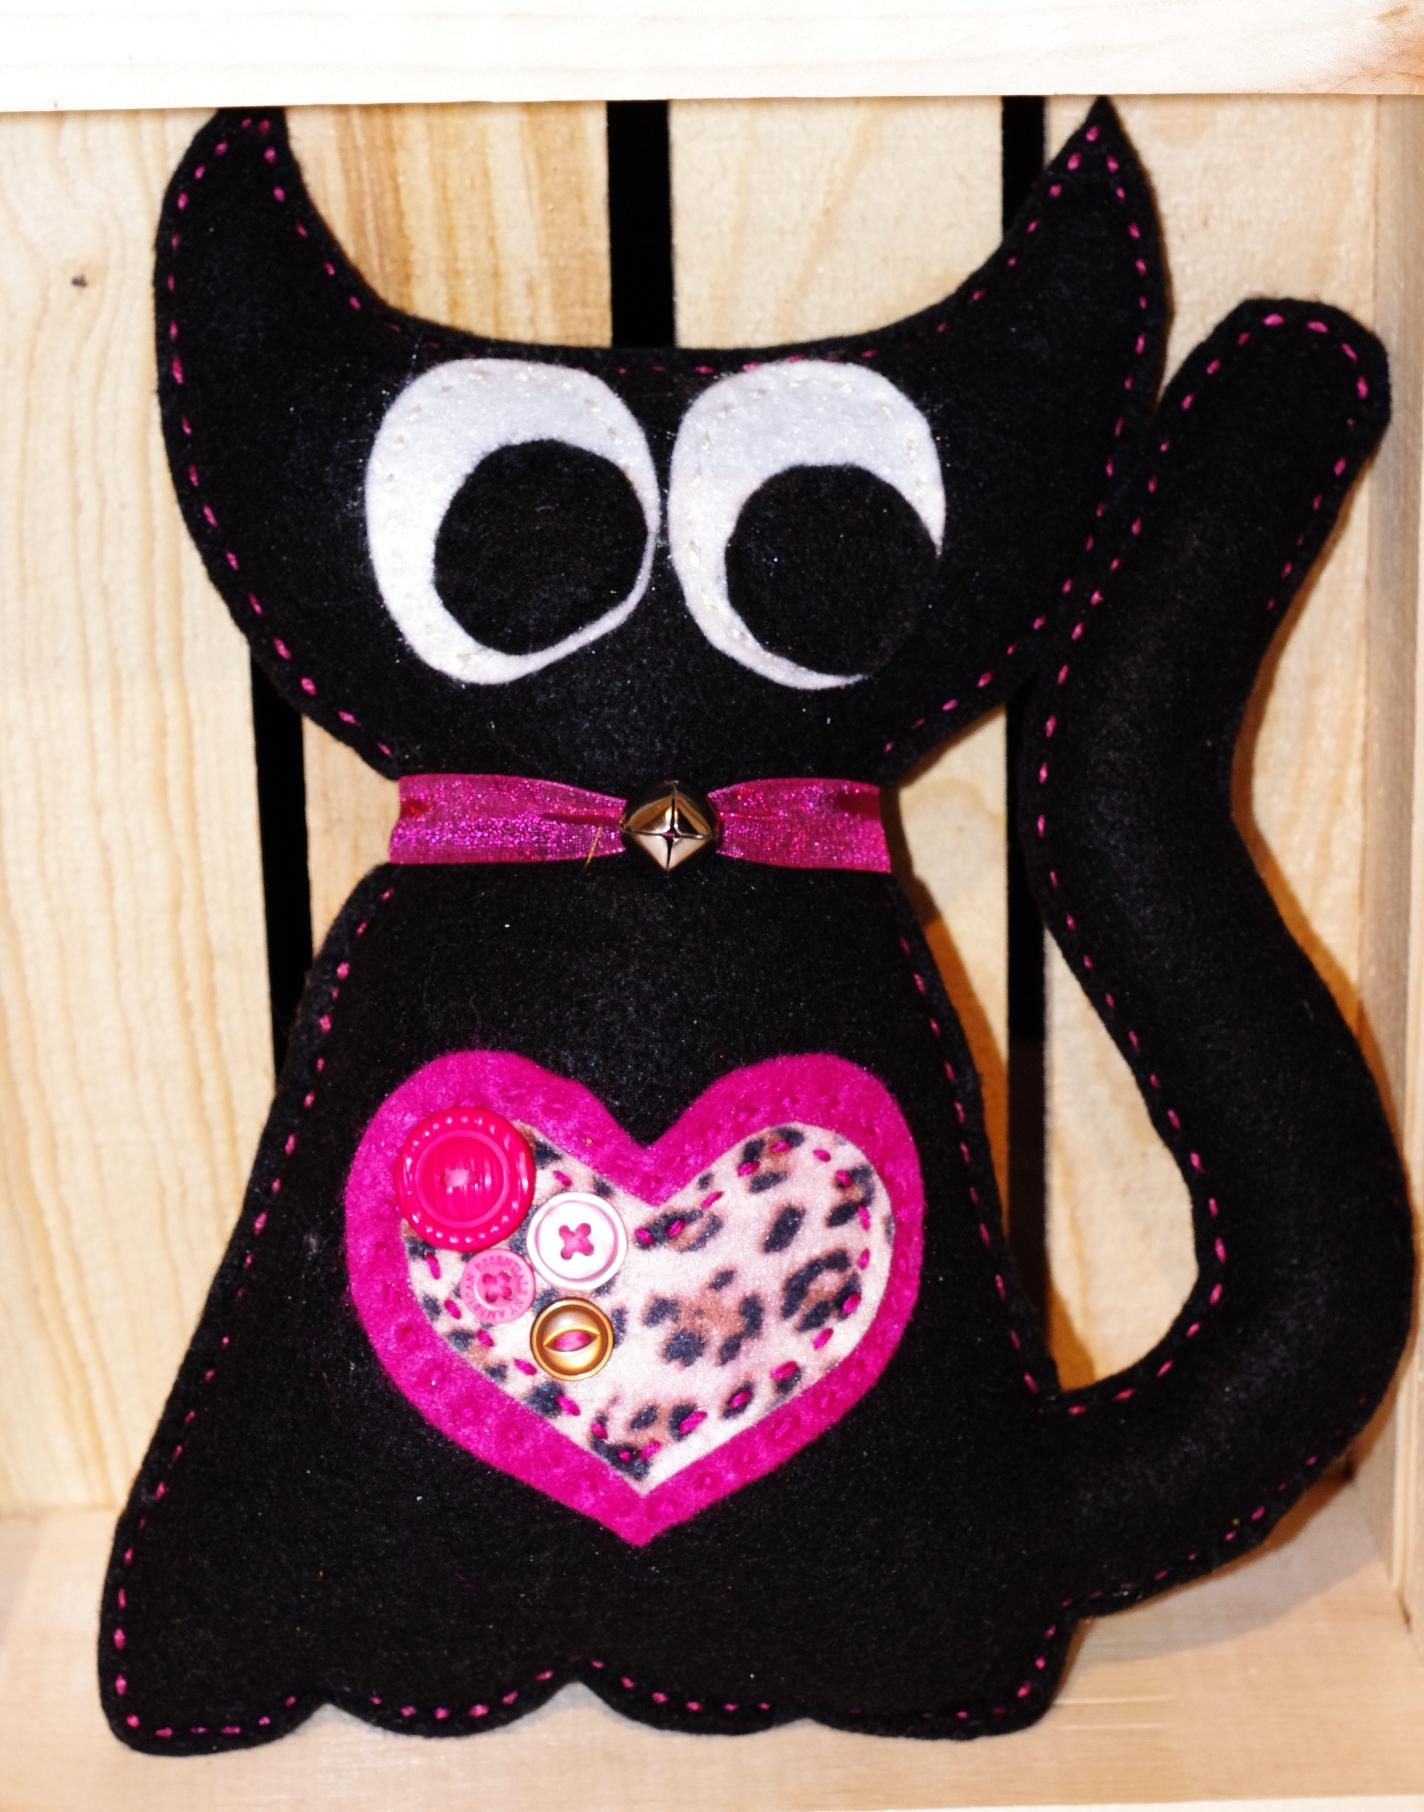 #C104 Chat noir coeur rose $25